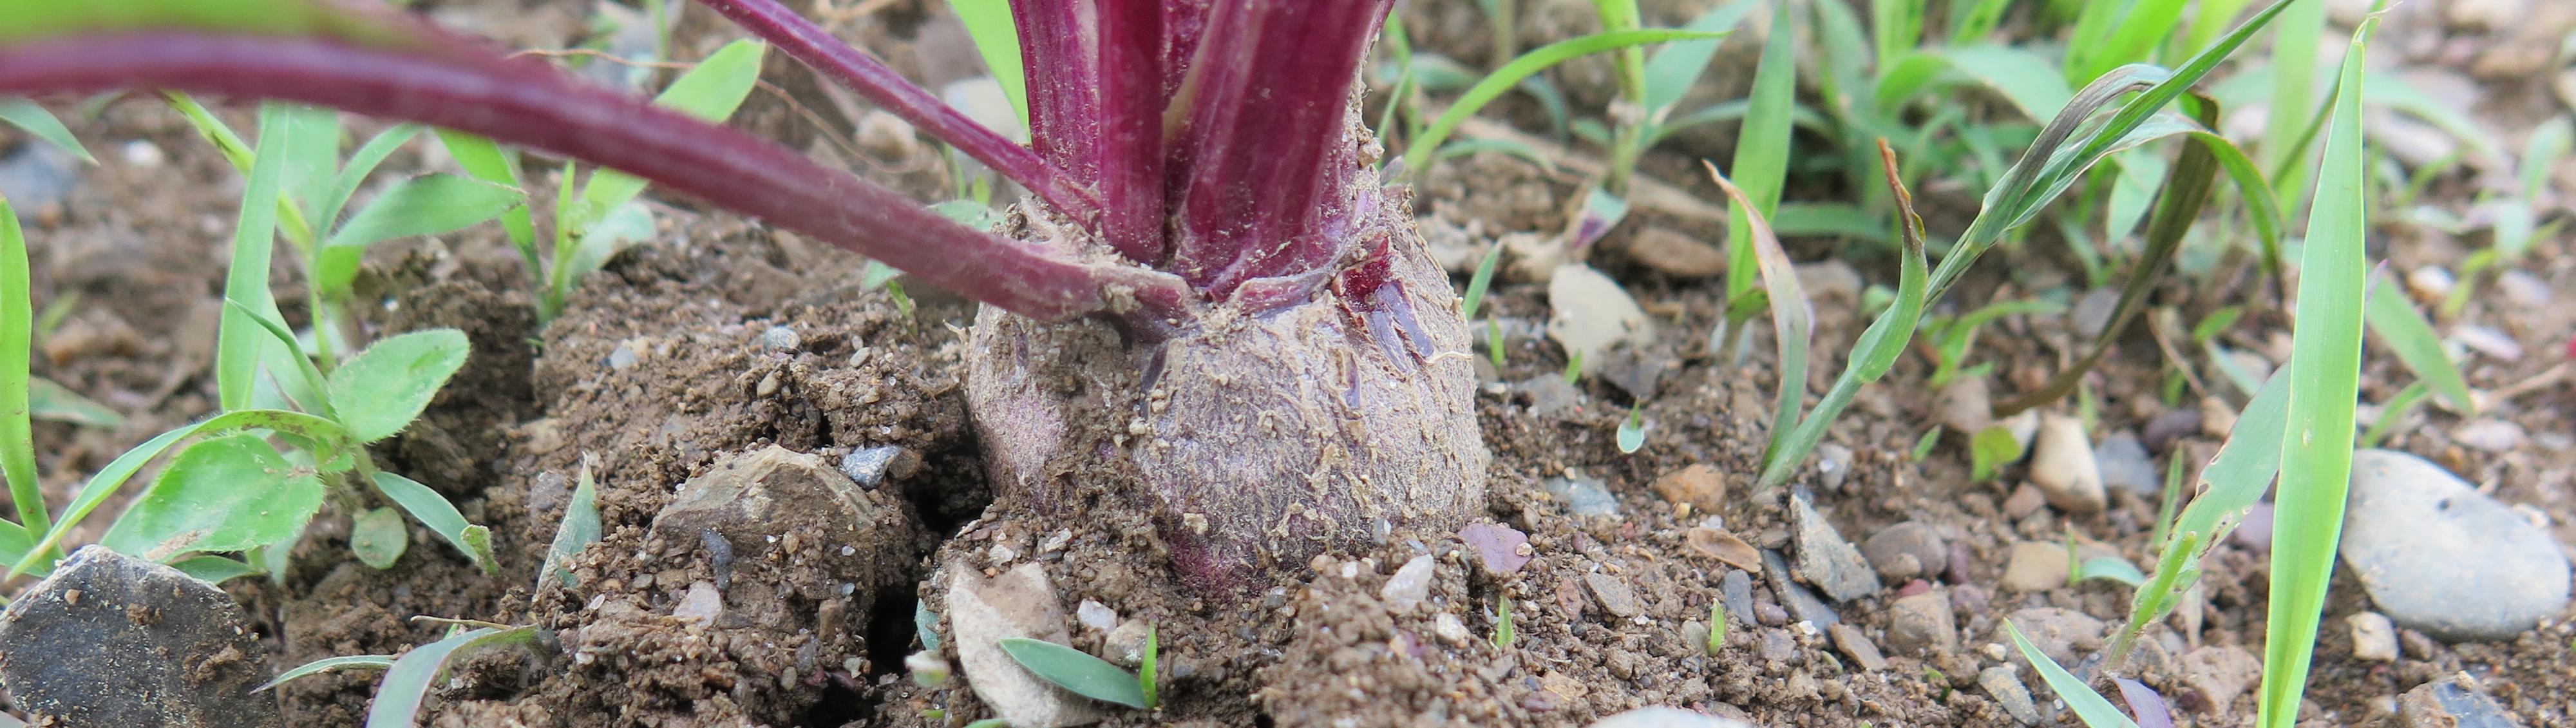 Petite betterave - Baby Beet